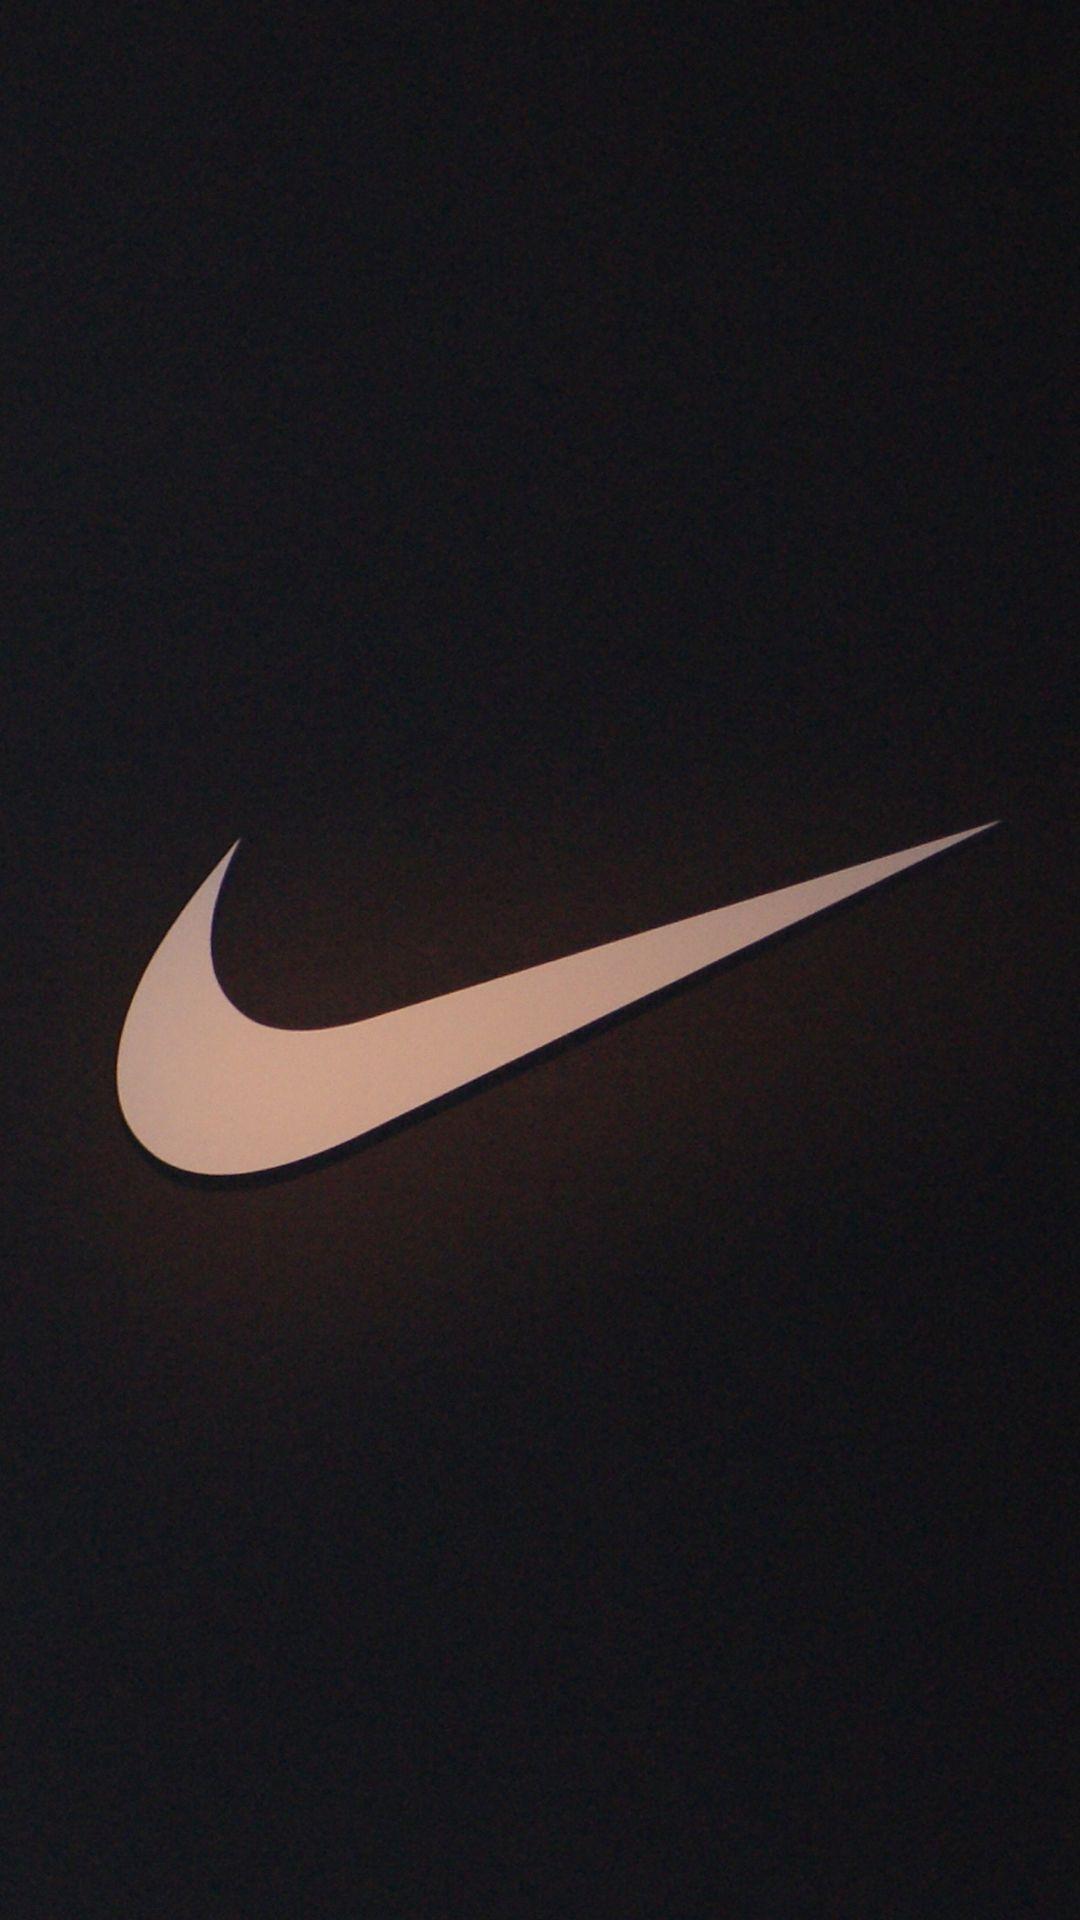 Nike Logo htc one wallpaper Best htc one wallpapers